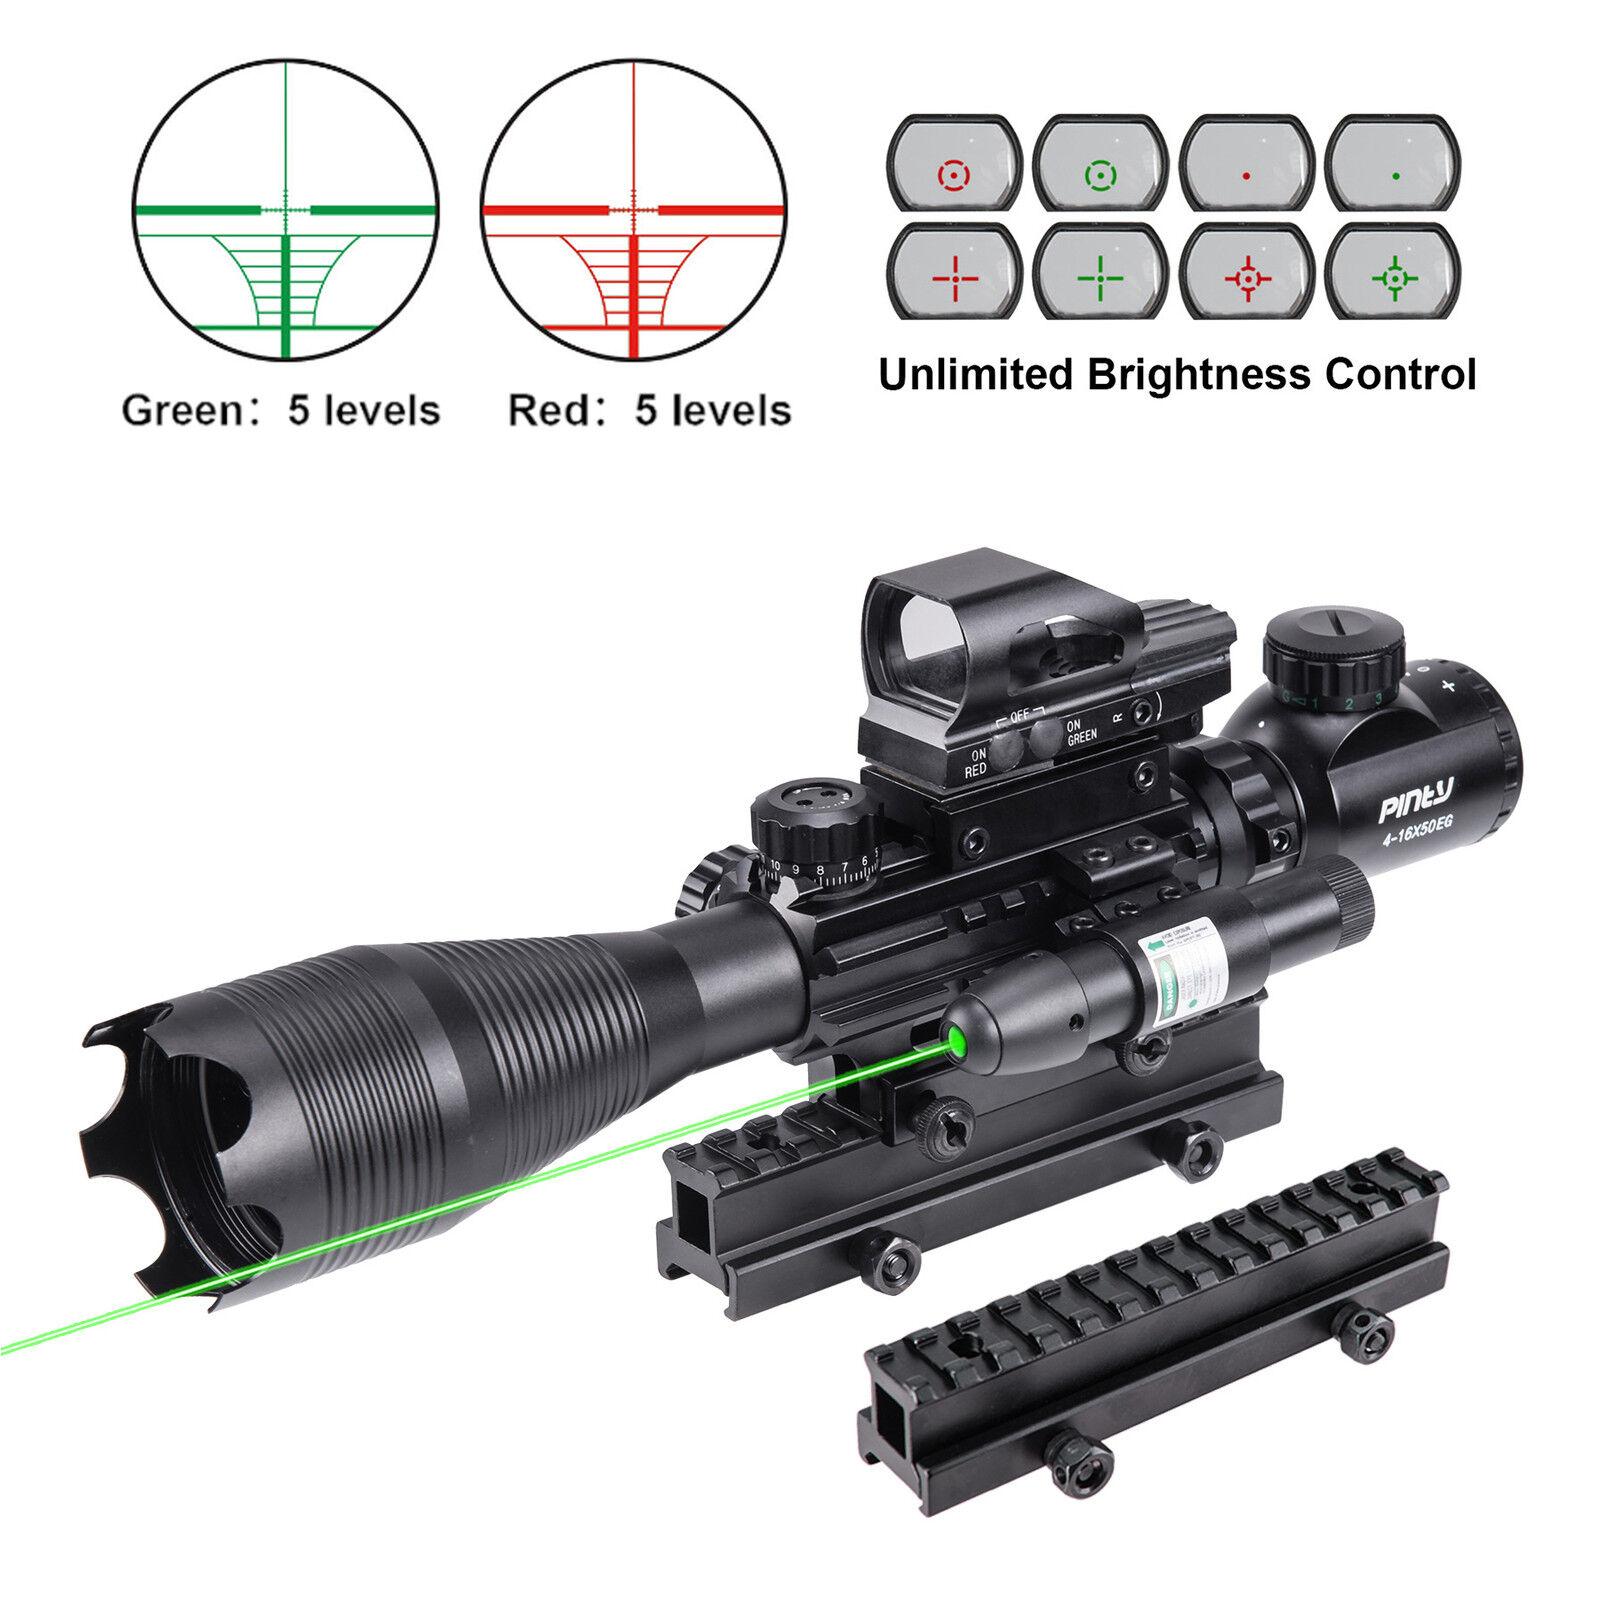 Rifle Scope Combo 4-16x50EG Illuminated Optics Sight & JG13 G Green Laser